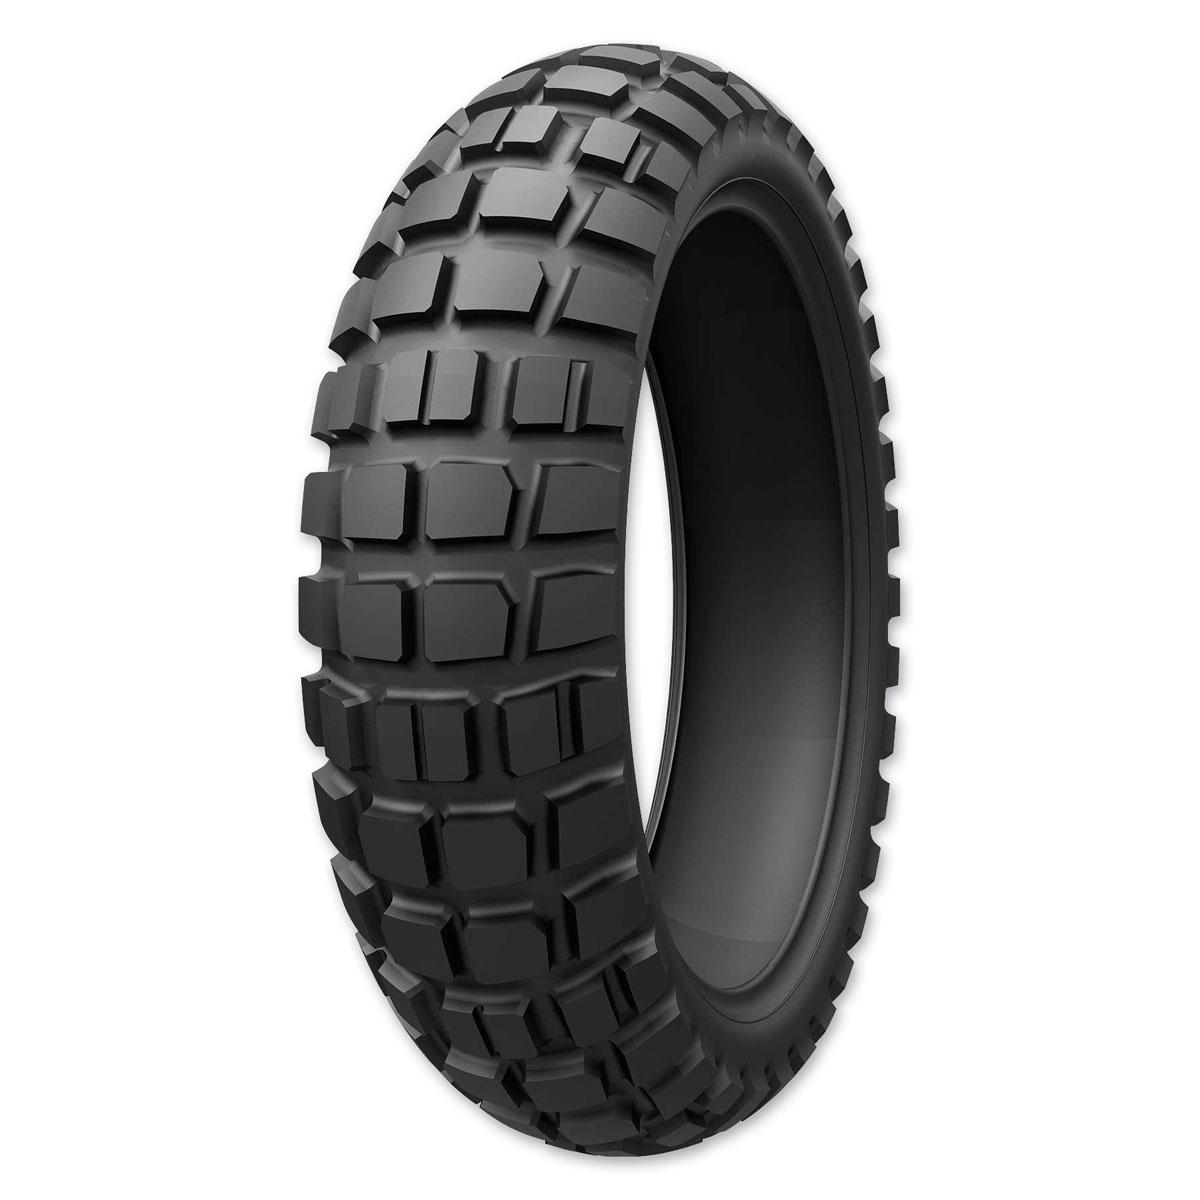 Kenda Tires K784 Big Block 150/70-17 Rear Tire